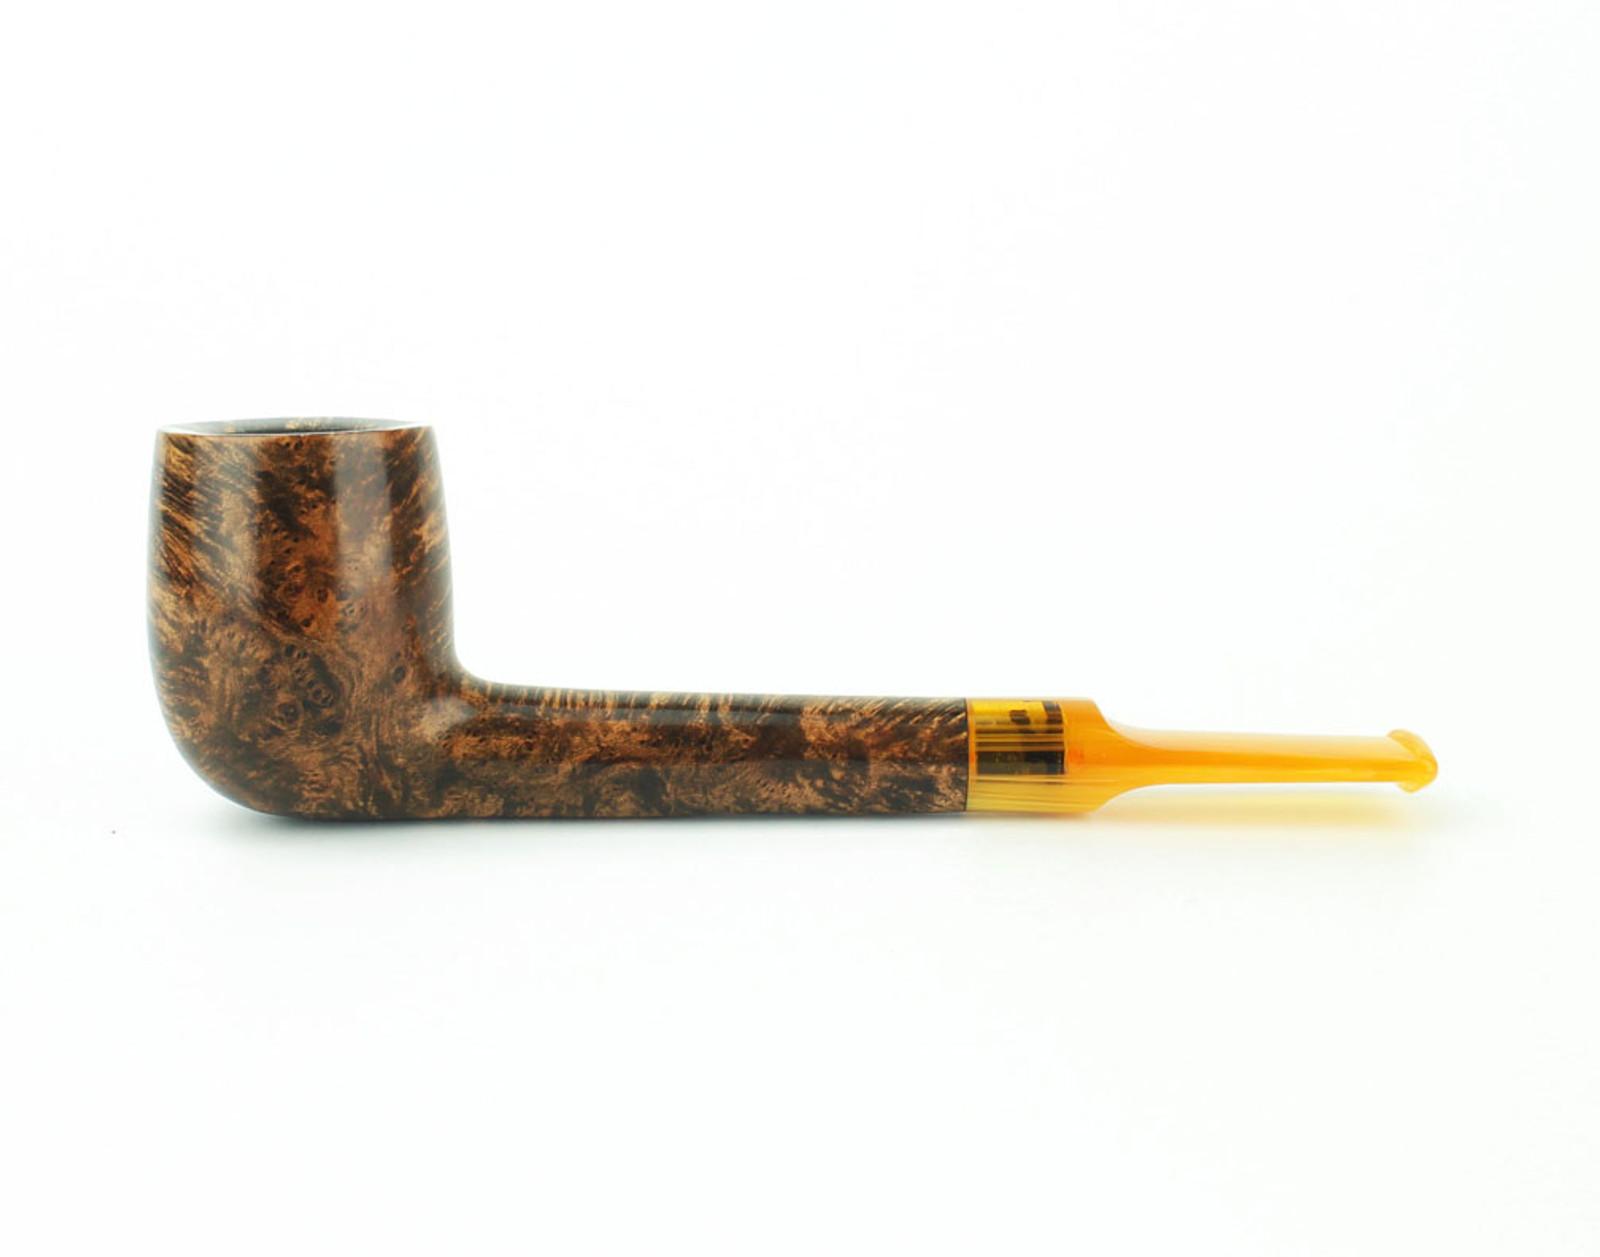 C23DS A - BriarWorks Classic C23 Lovat - Dark Smooth w/ Amber Stem